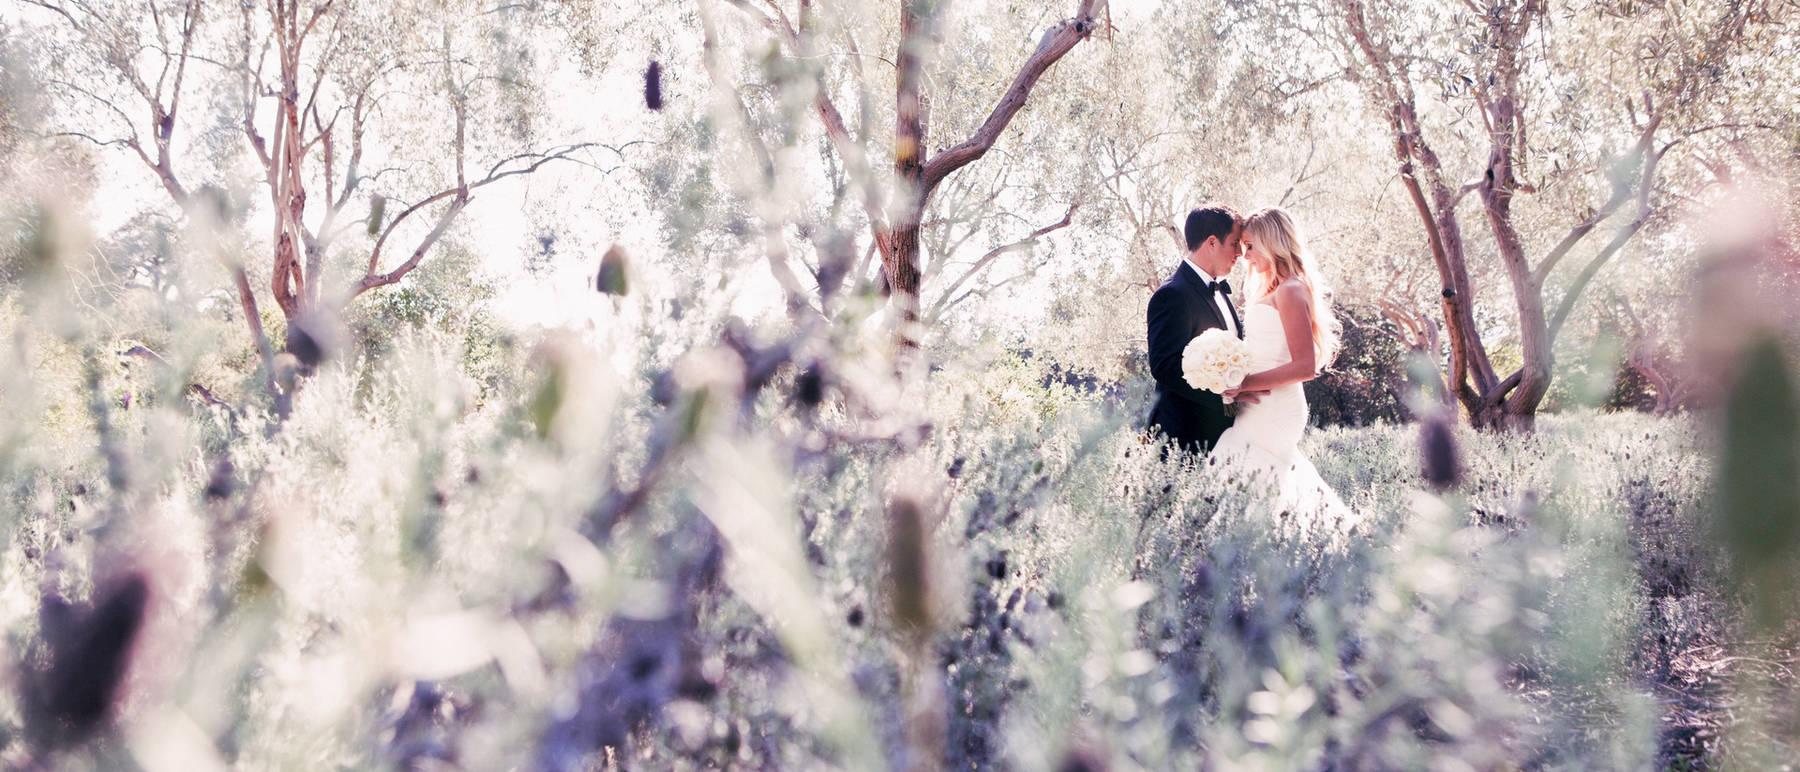 johnandjoseph-wedding-photographer-hz-slider-166